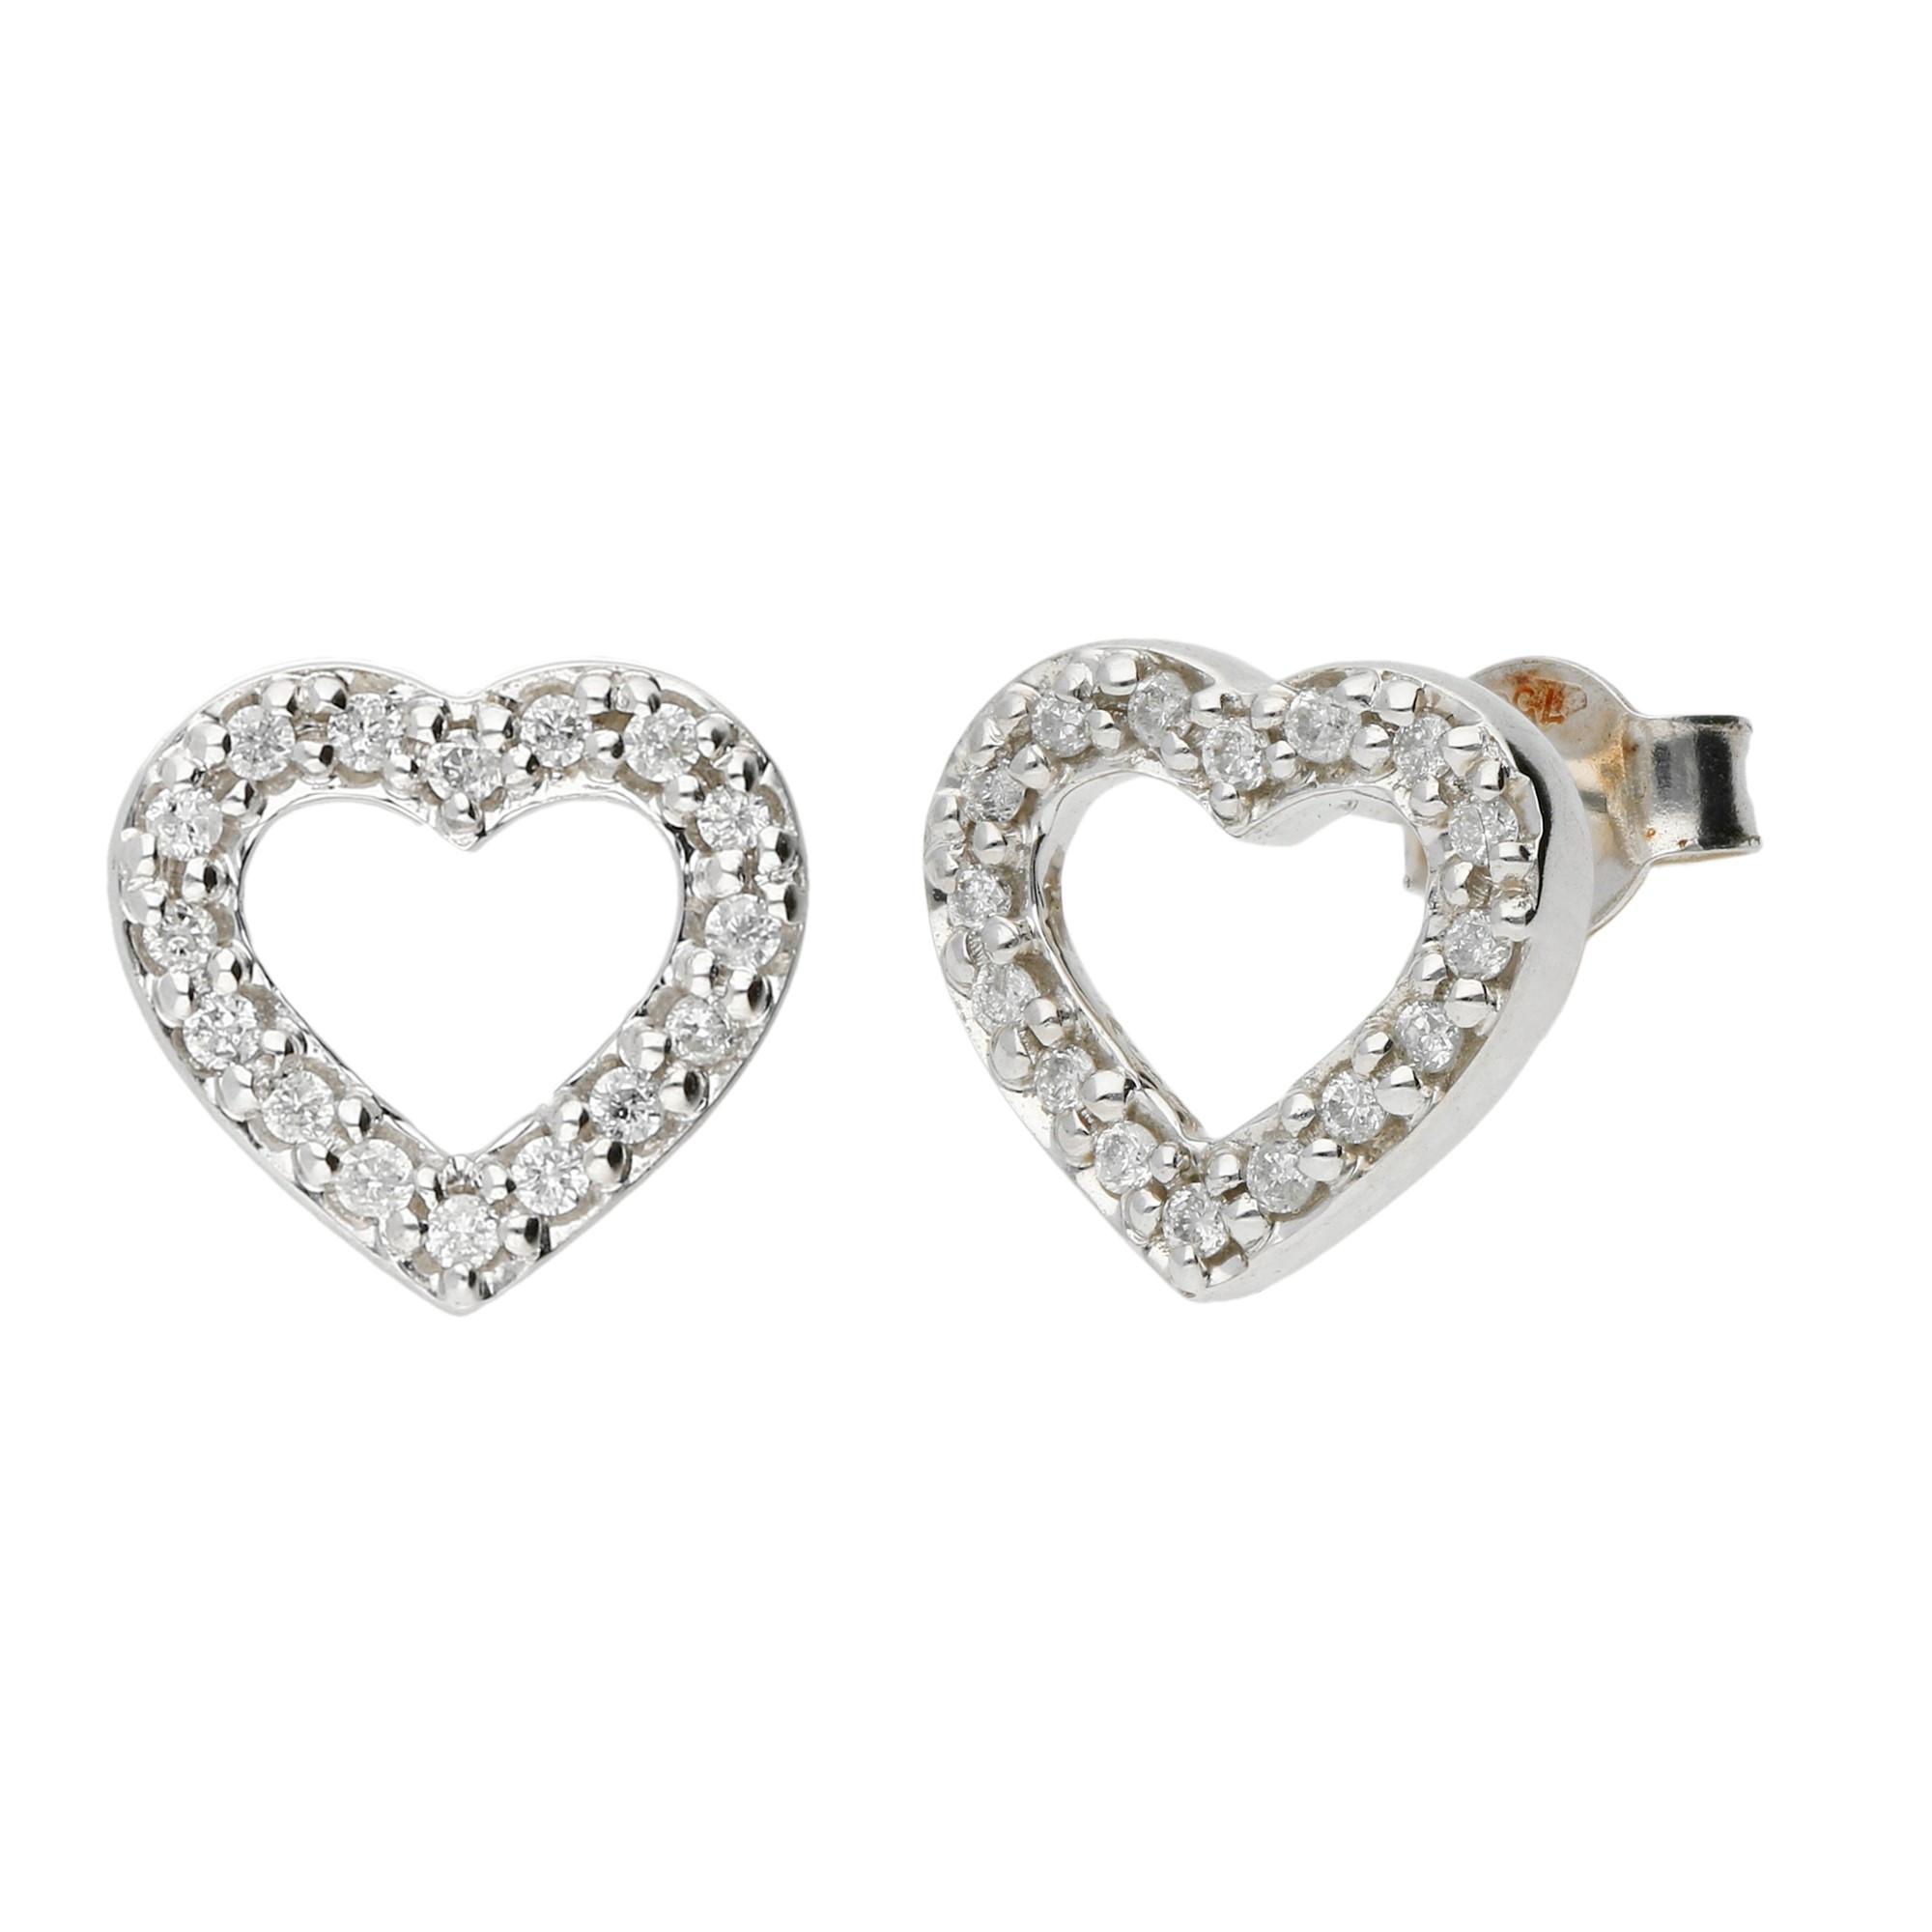 18ct White Gold Diamond Heart Stud Earrings Buy Online Free Insured Uk Delivery